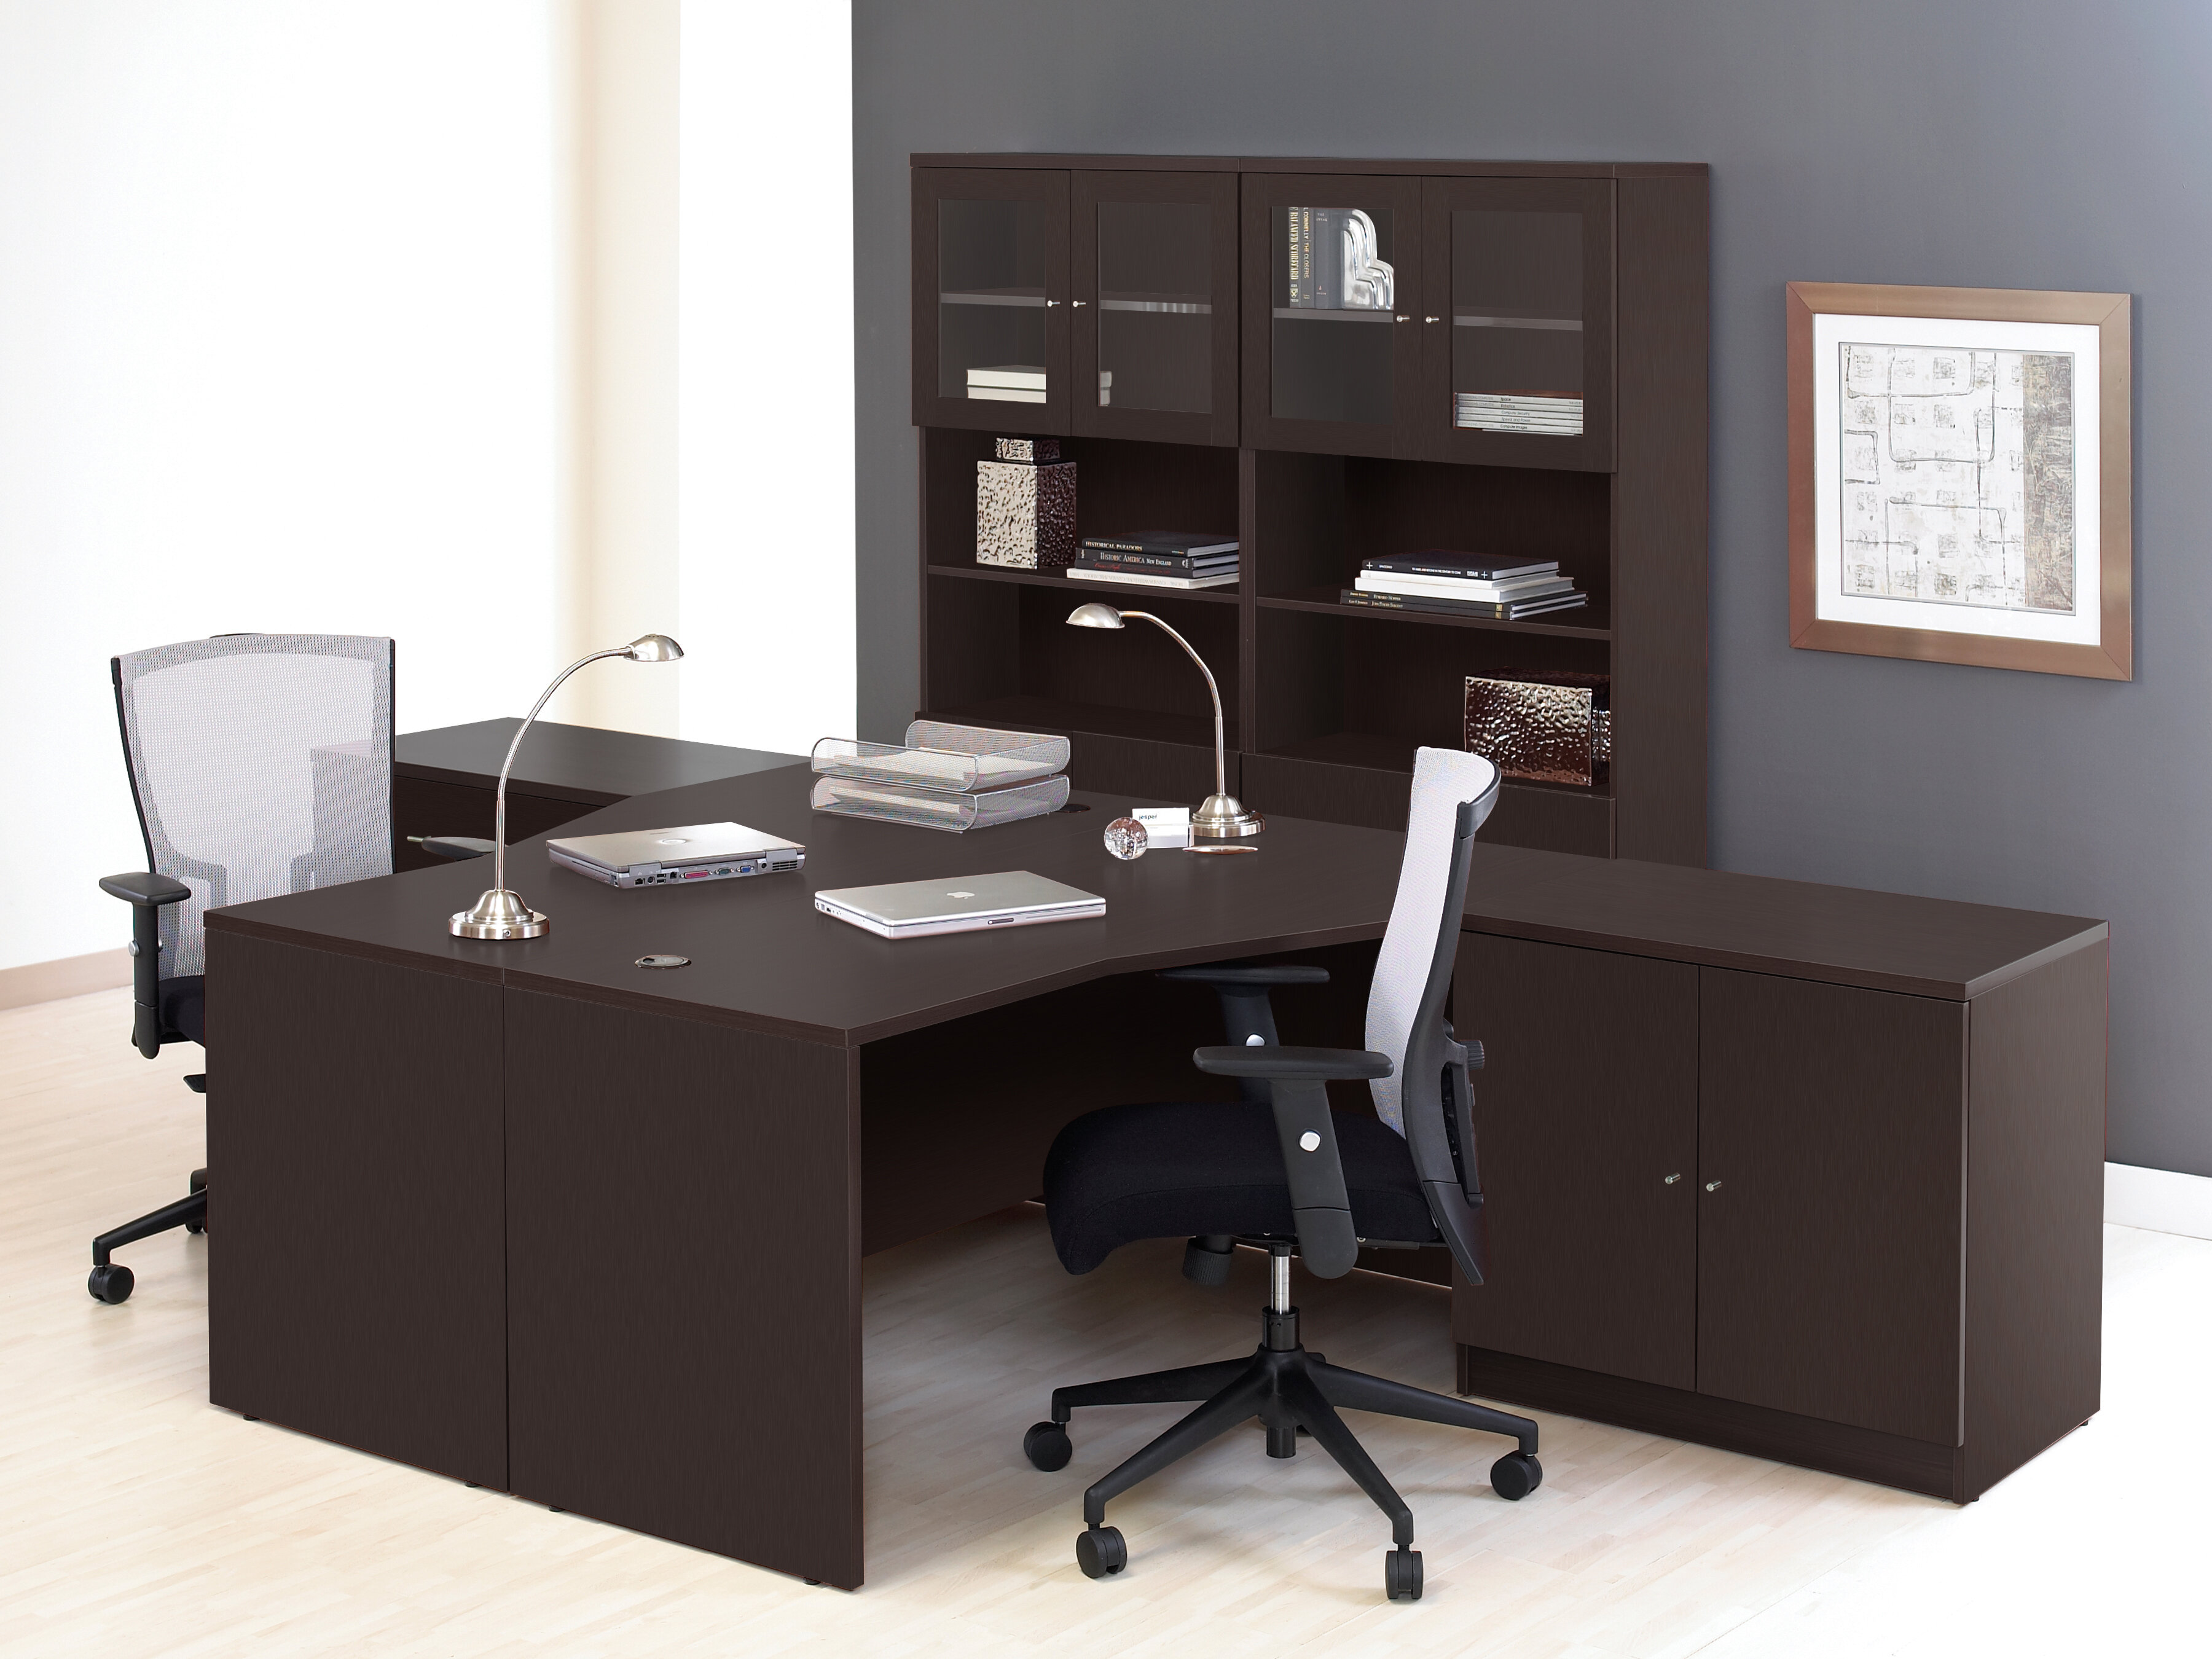 Haaken Furniture Pro X 6 Piece L Shaped Desk Office Suite | Wayfair